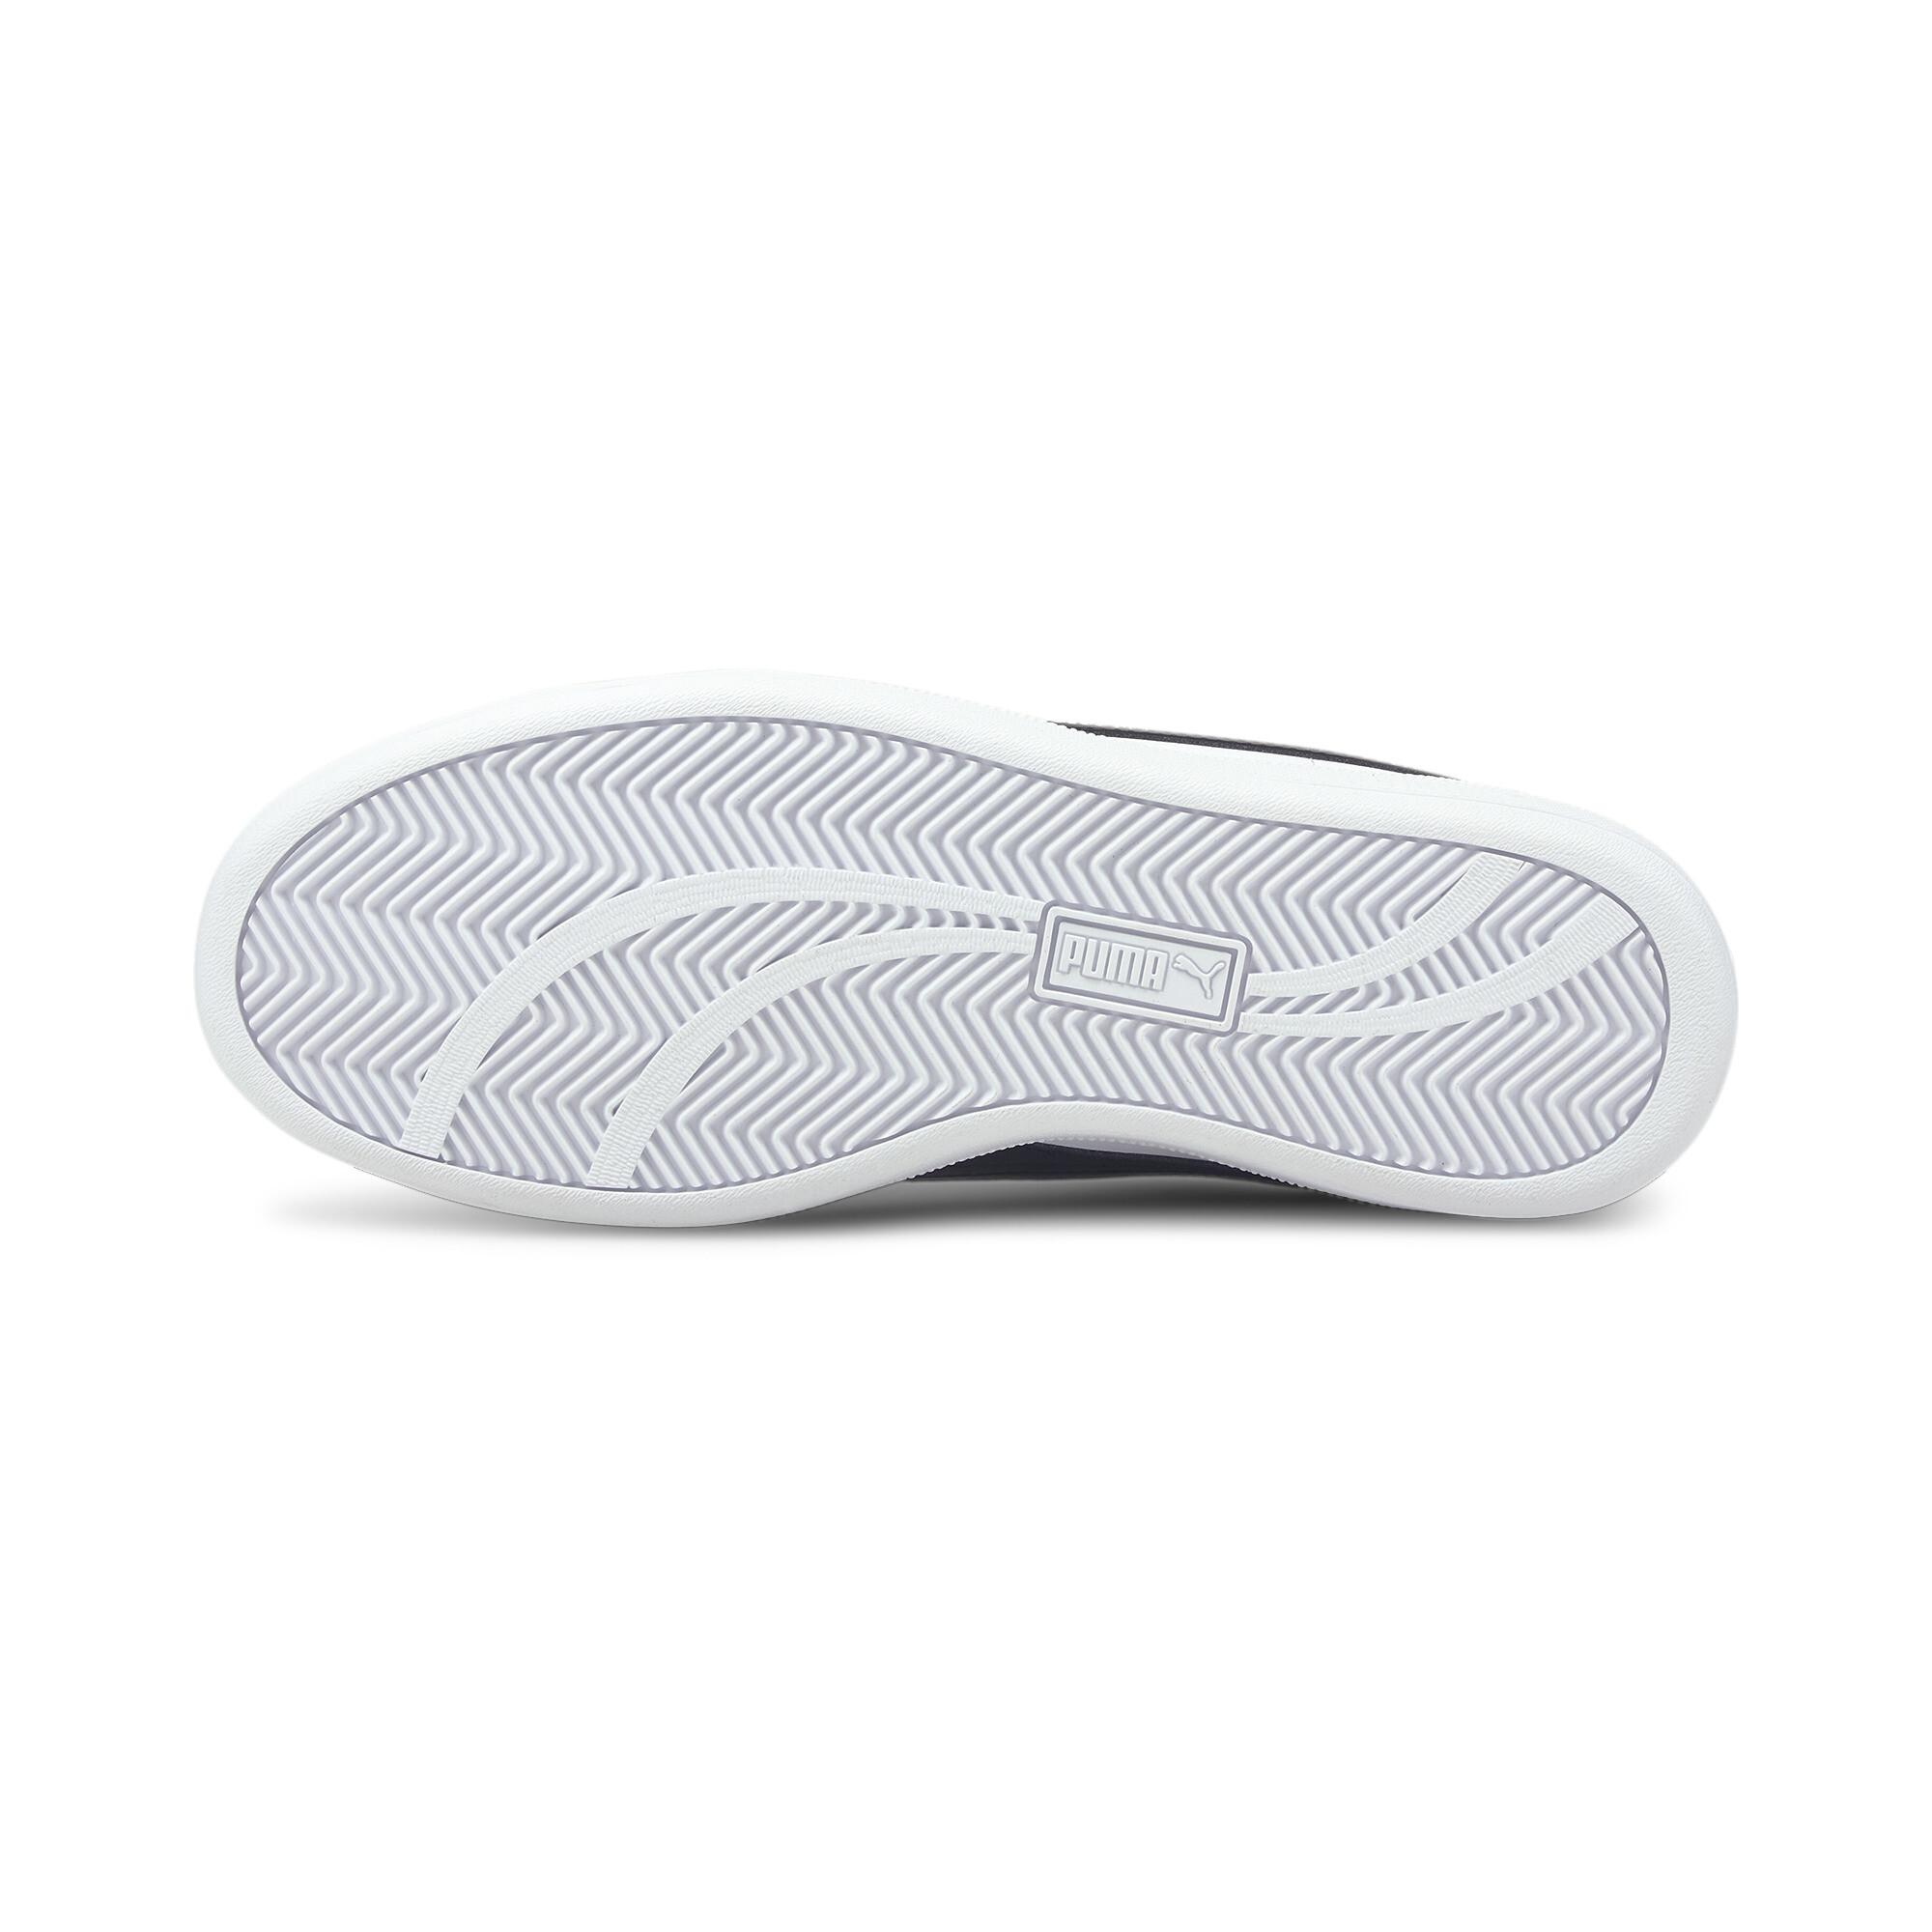 Indexbild 15 - PUMA Smash Trainers Schuhe Sneakers Sport Classics Unisex Neu